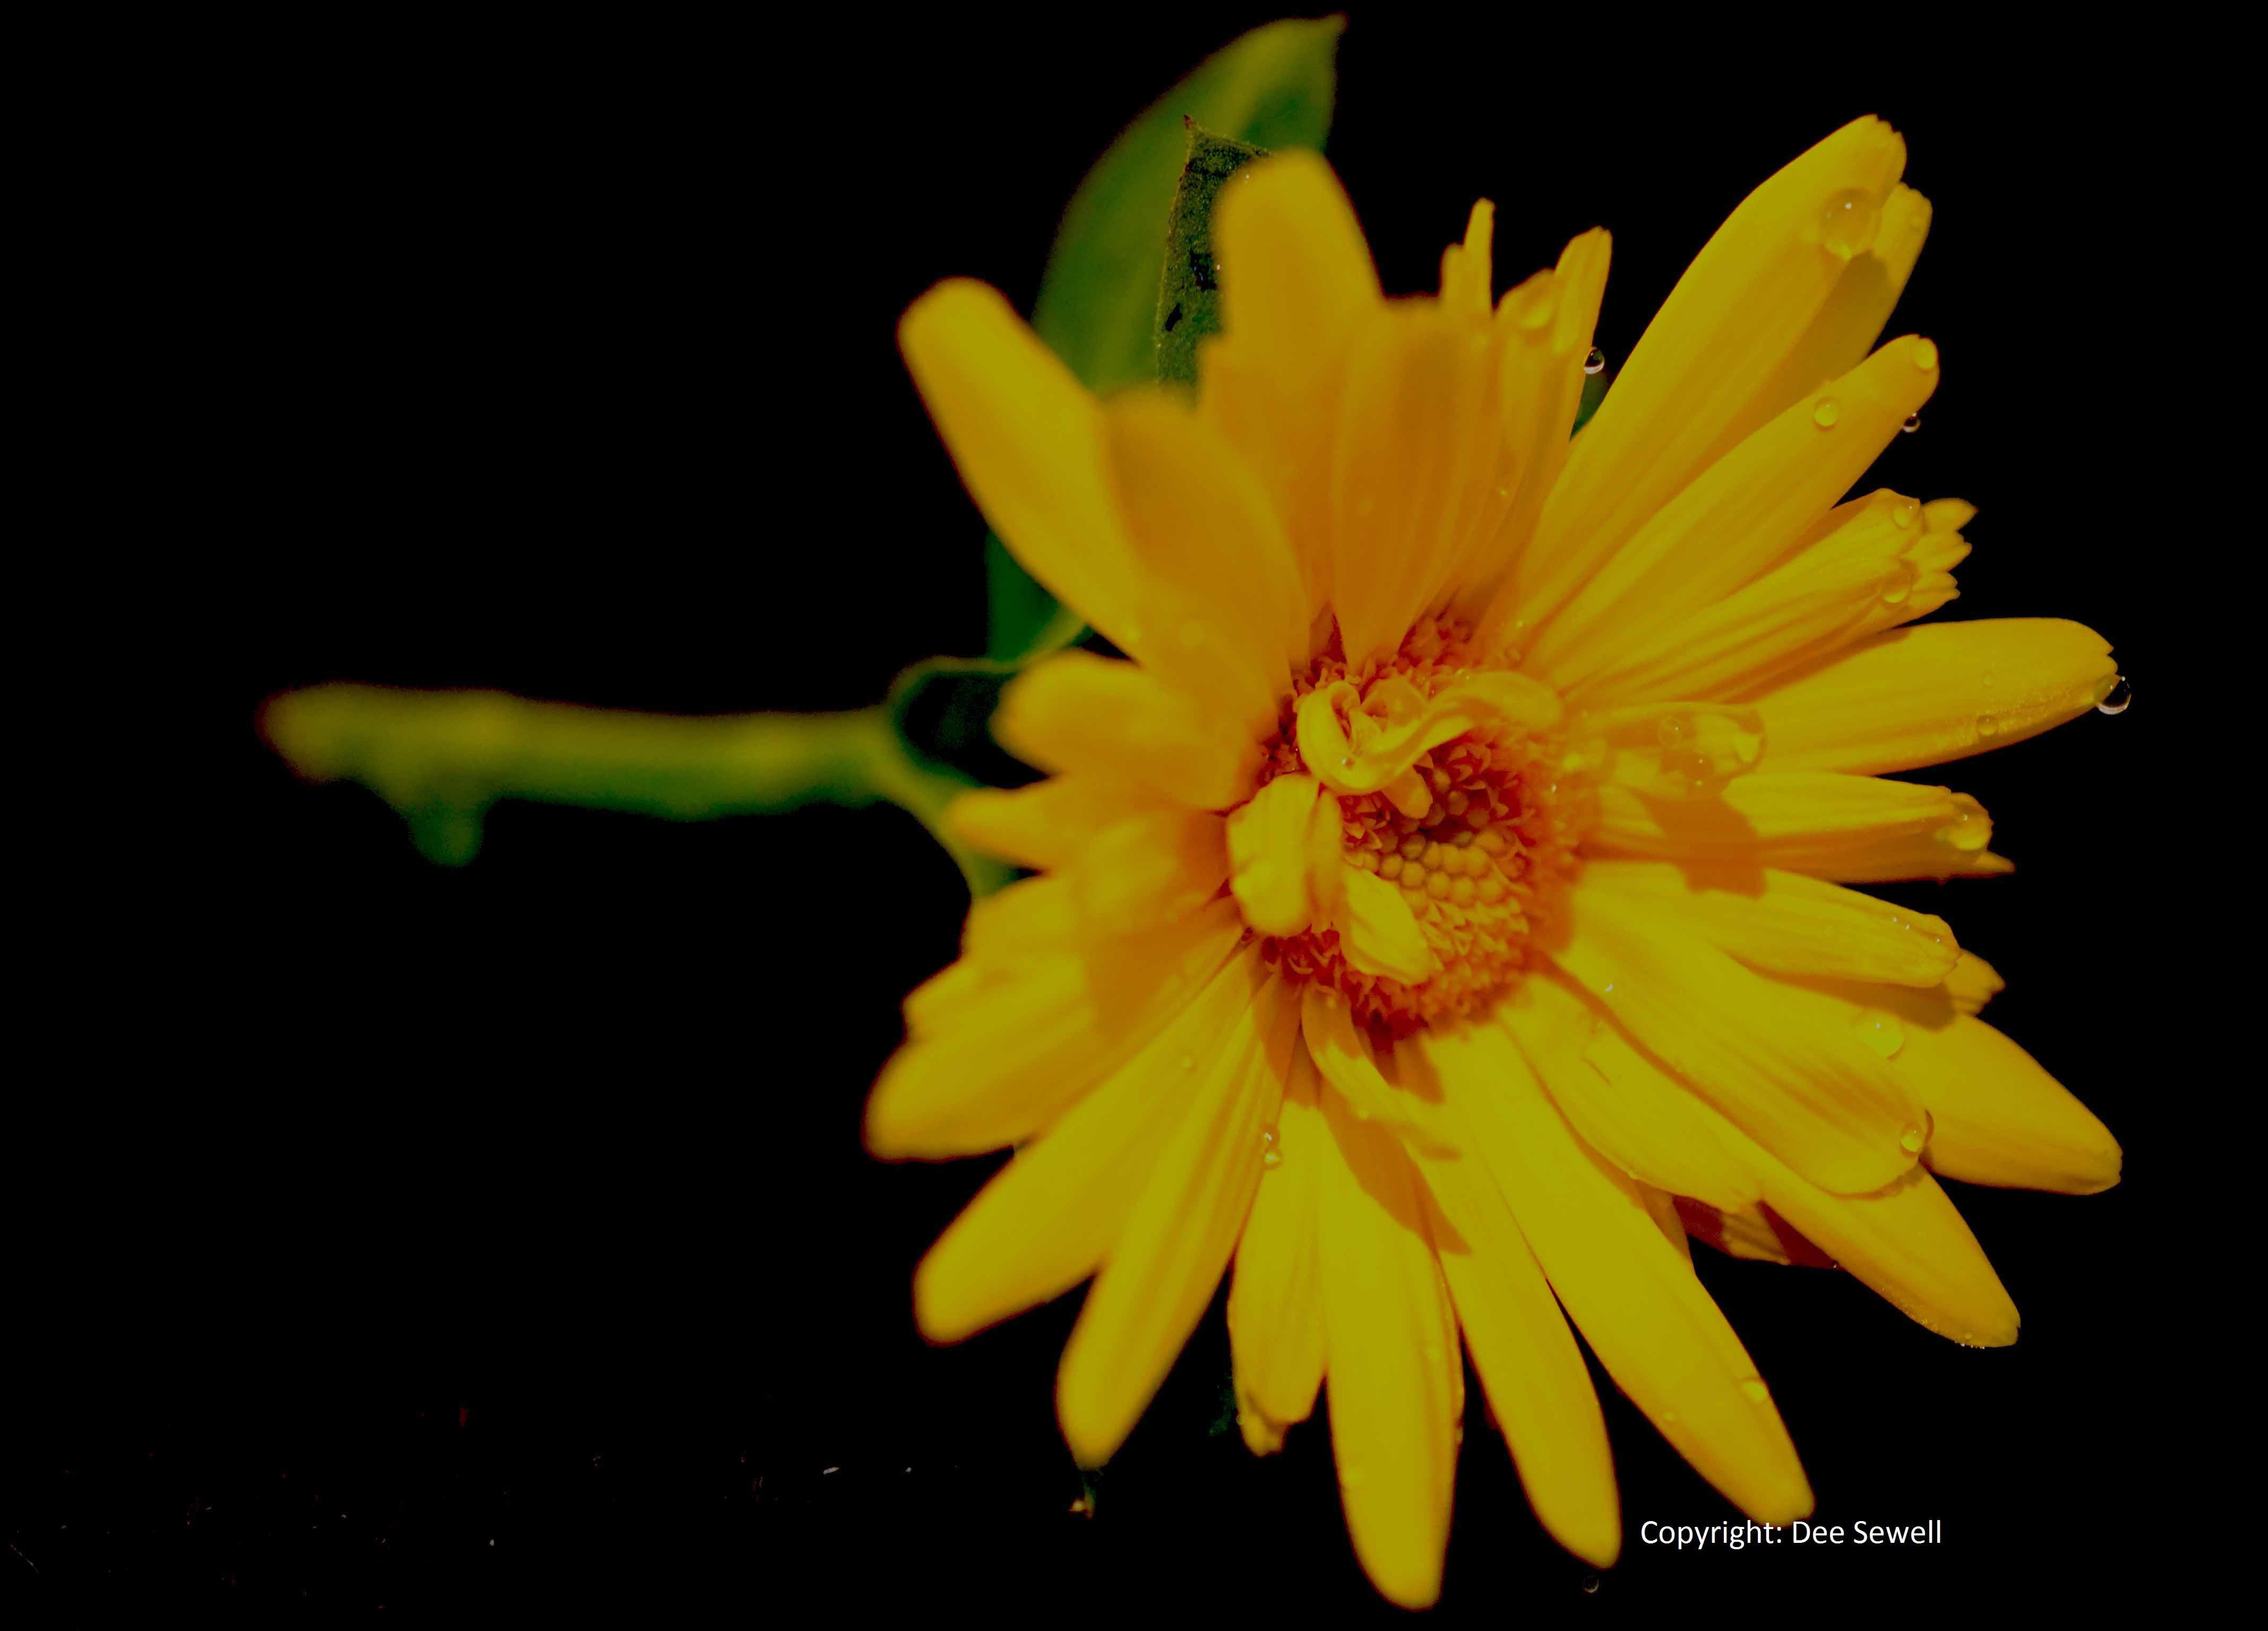 Callendula in flower in January